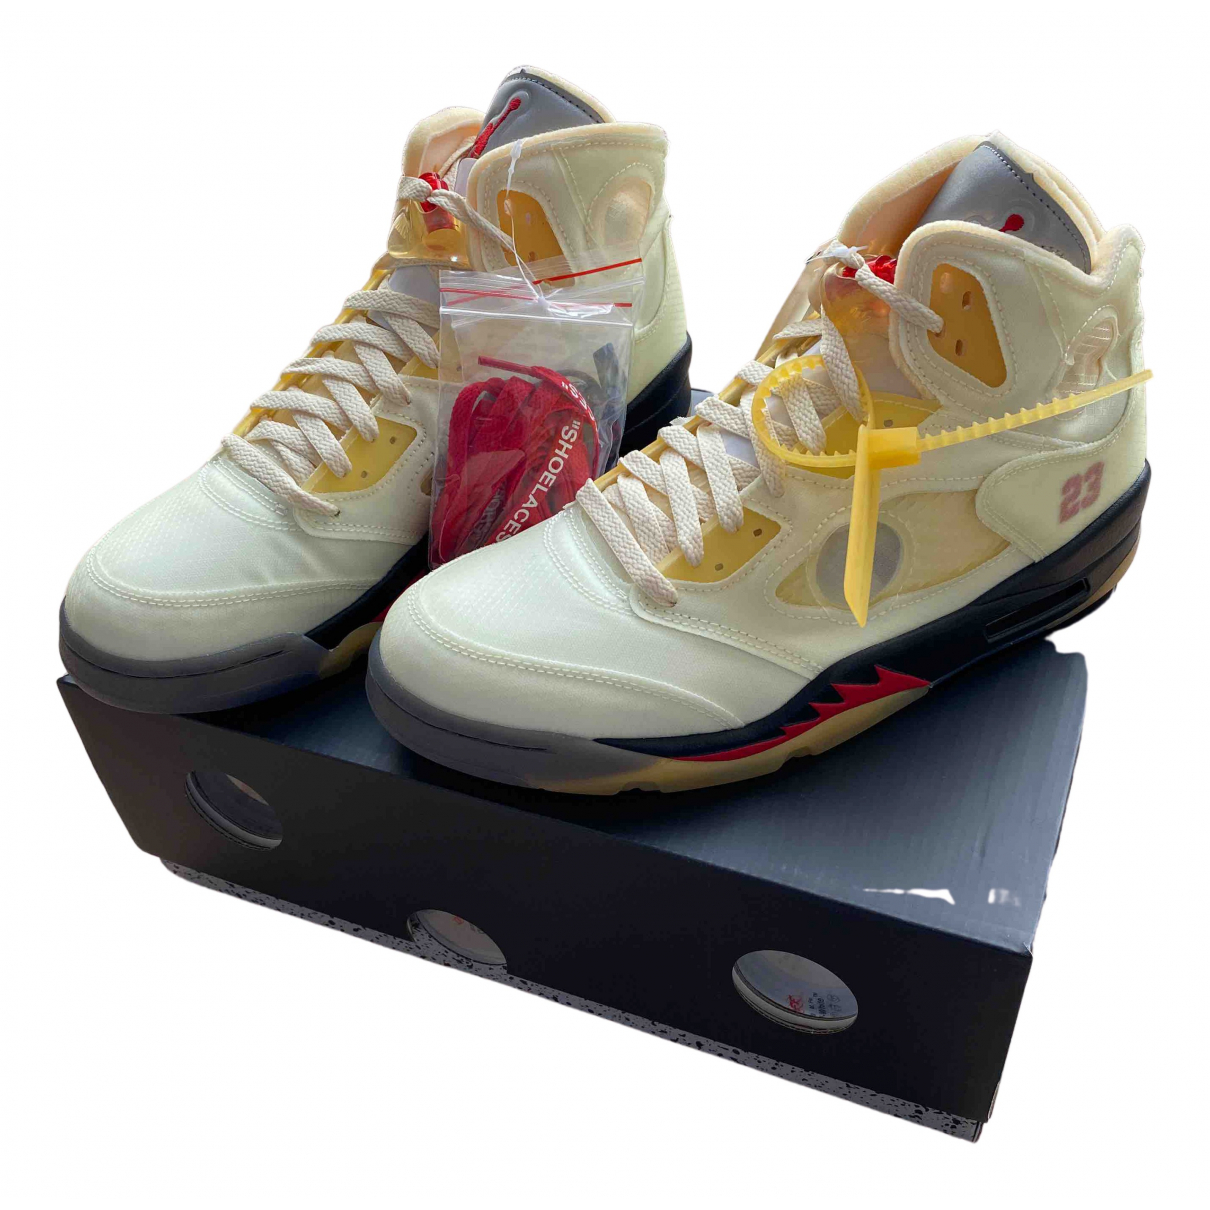 Nike X Off-white - Baskets Jordan 5 pour homme en cuir - beige